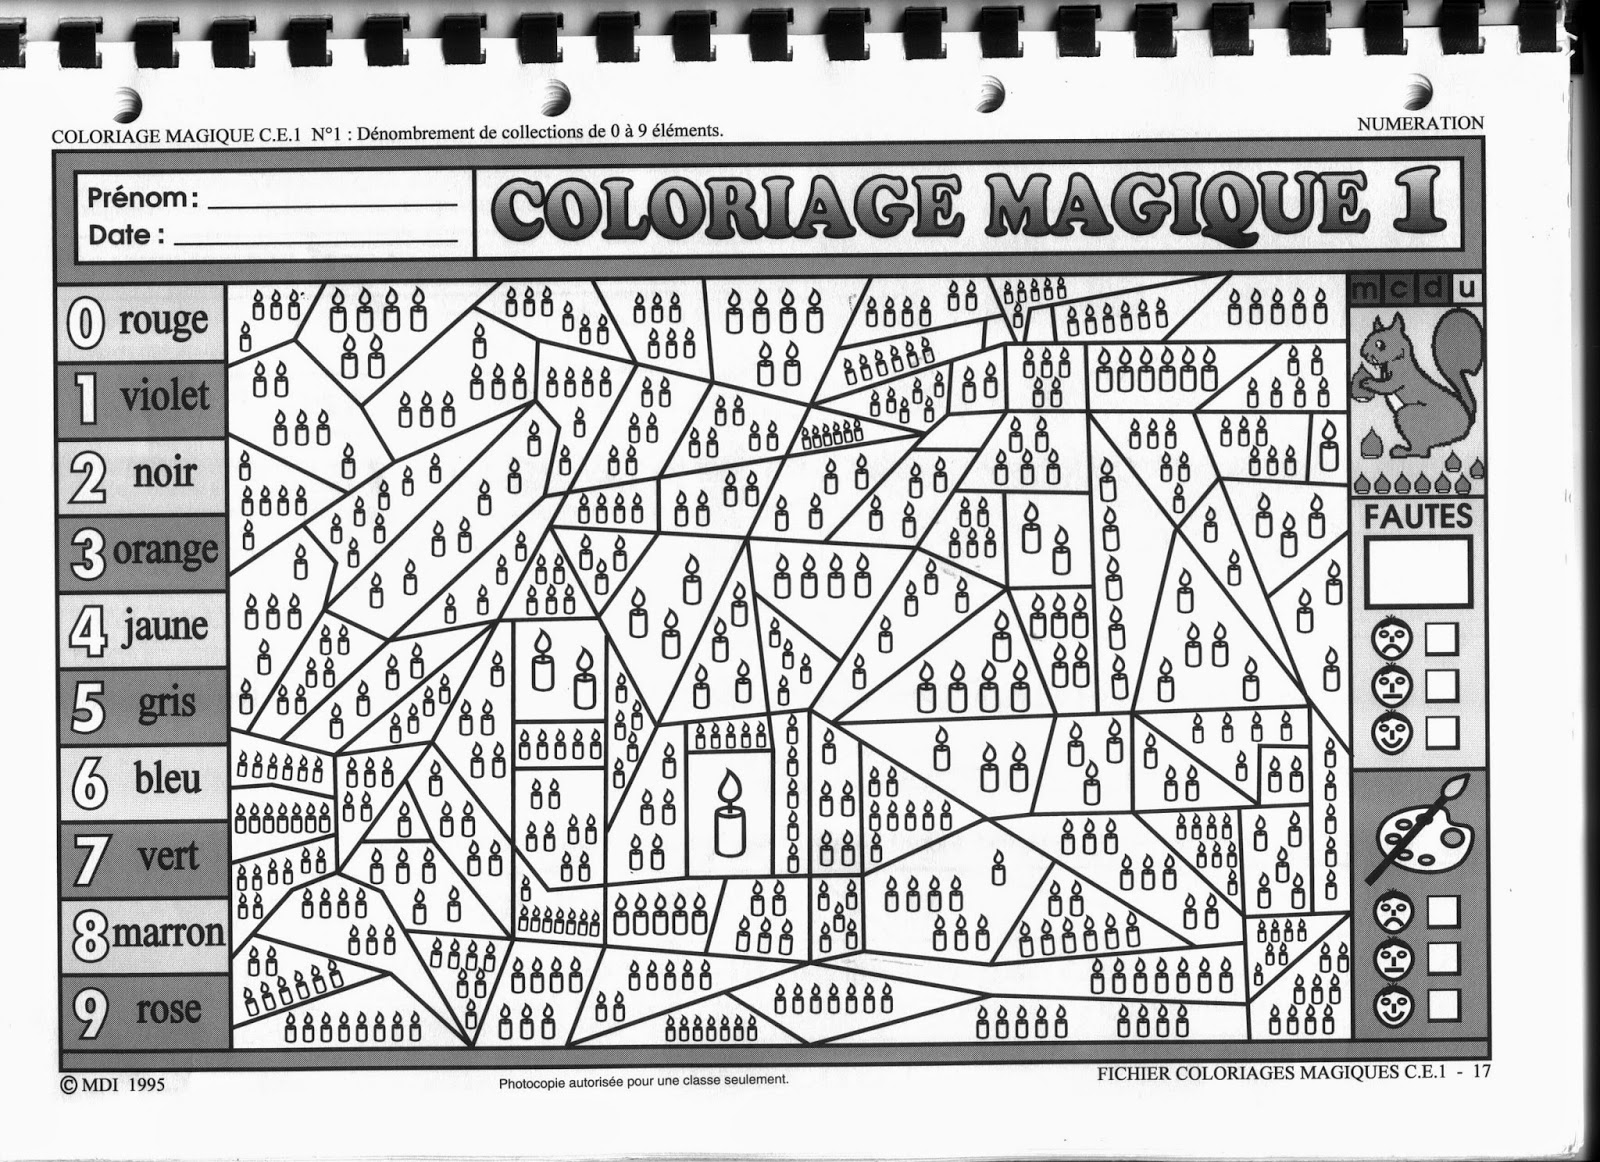 Pin Coloriage-magique-calcul-difficile-prince On Pinterest